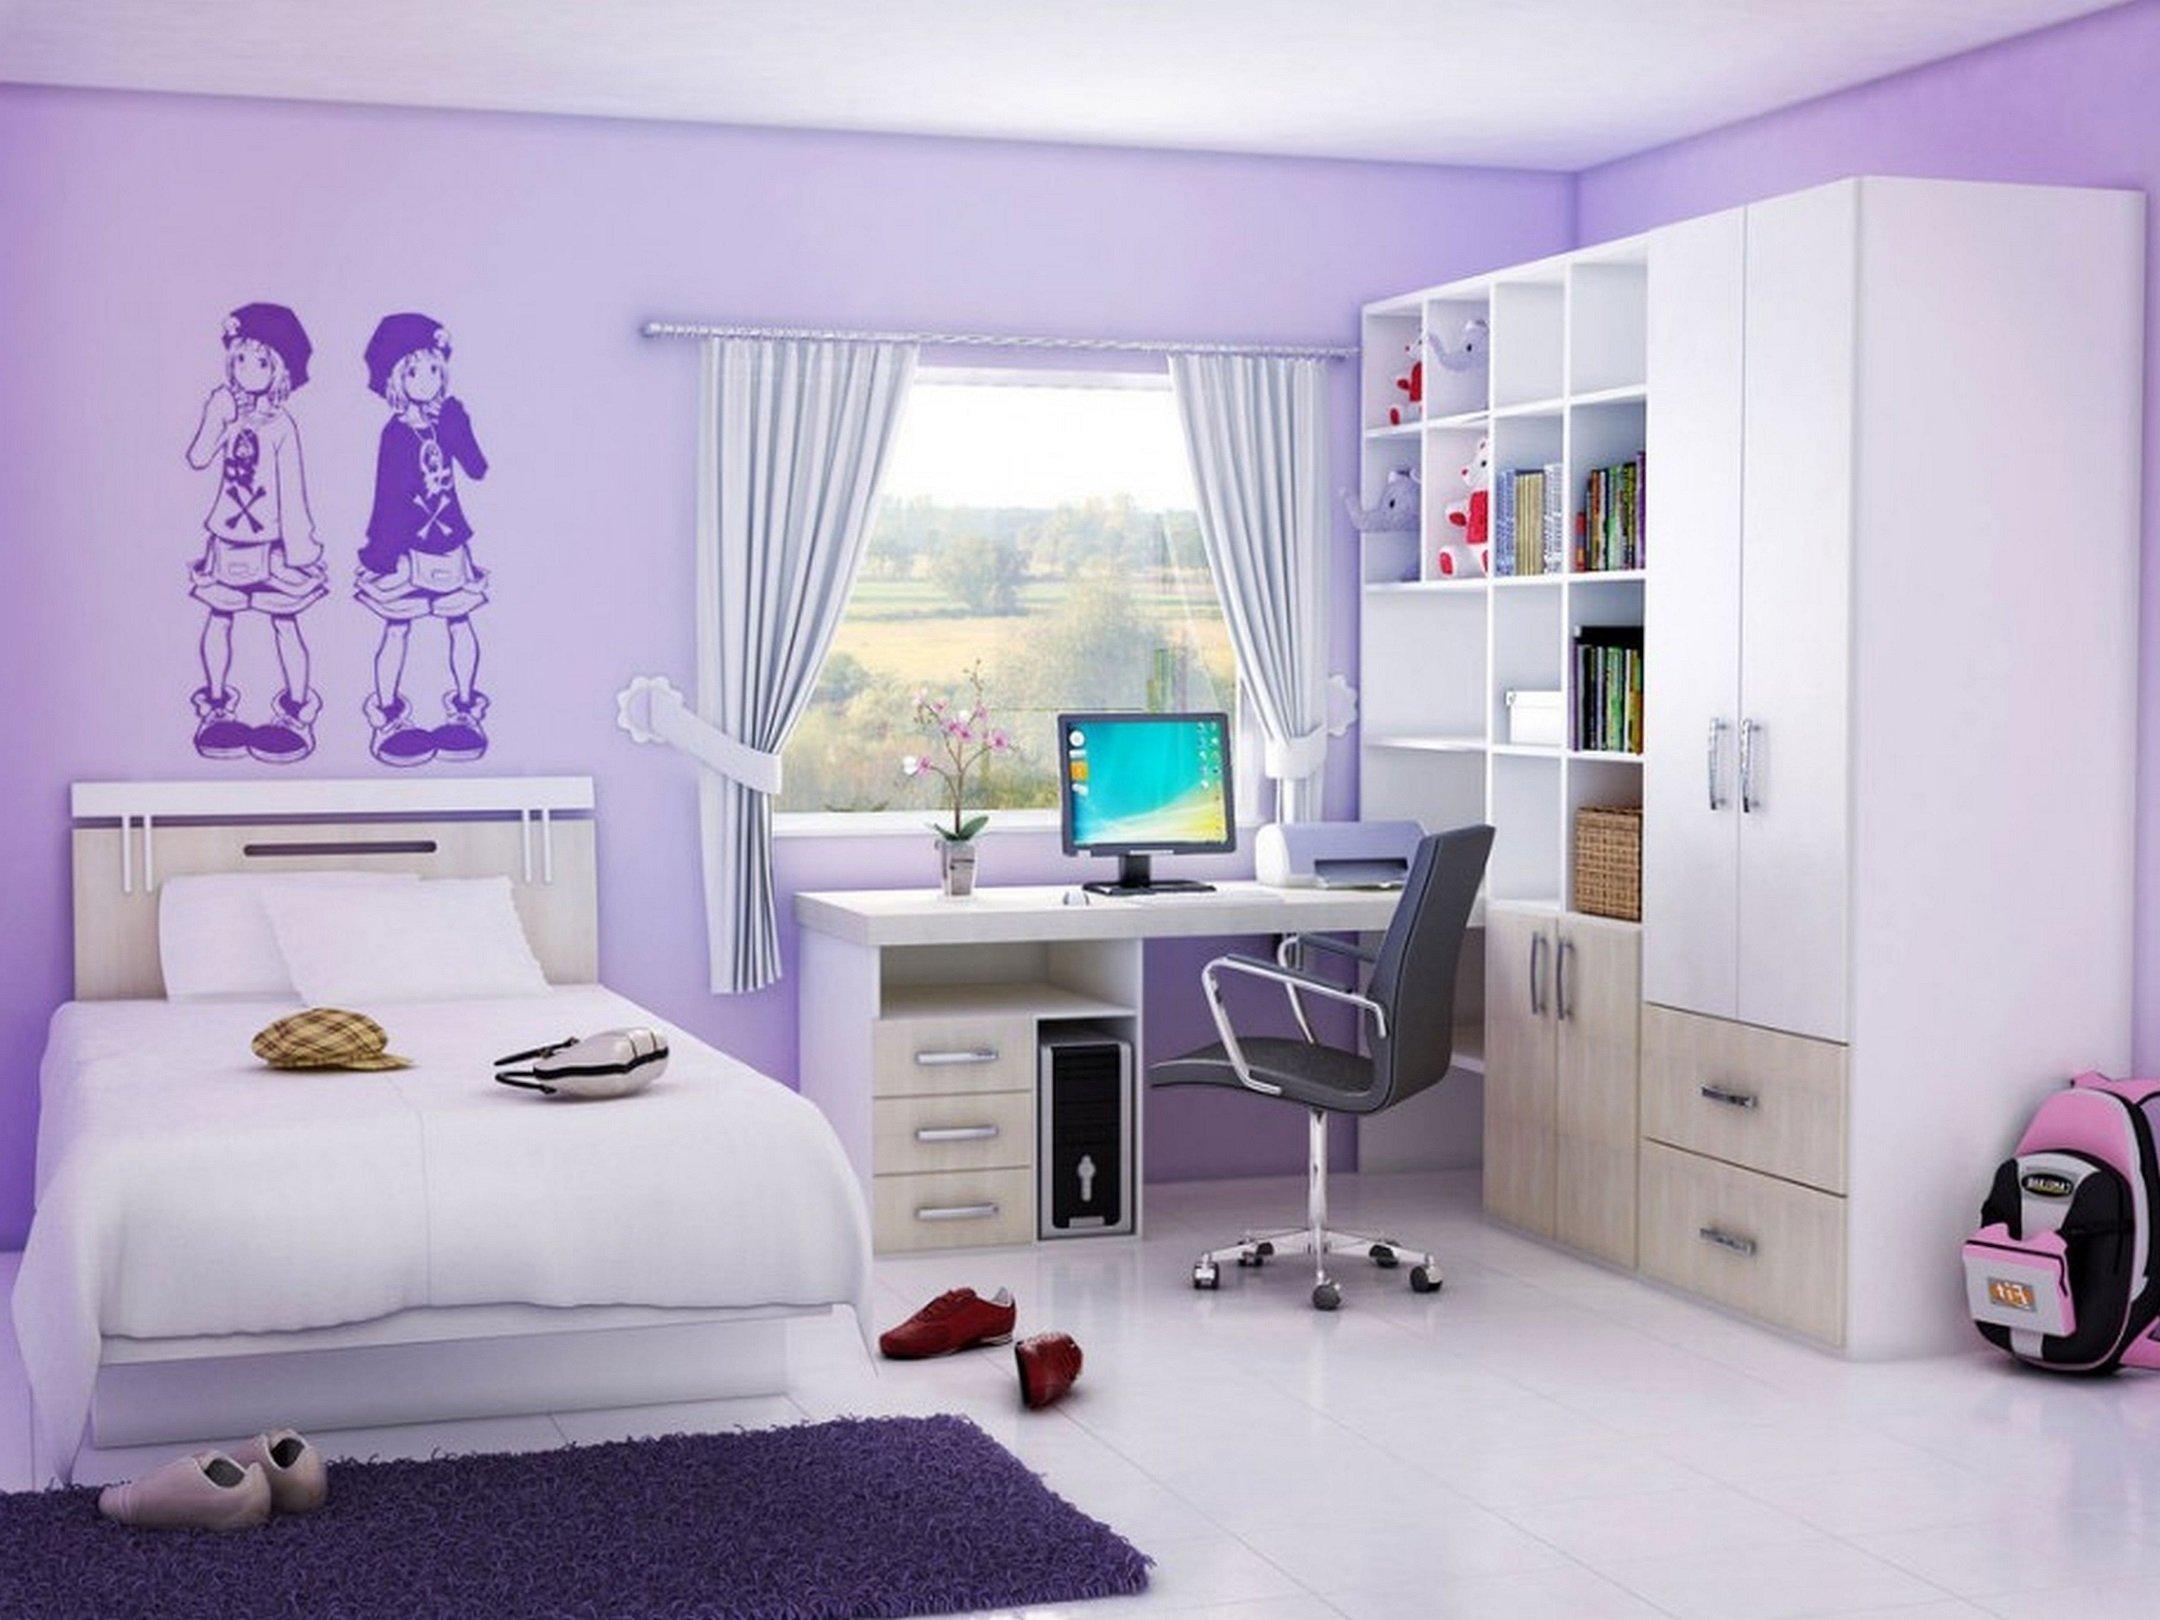 10 Great Teenage Girl Small Bedroom Ideas teenage girl bedroom ideas for small rooms 5 2020